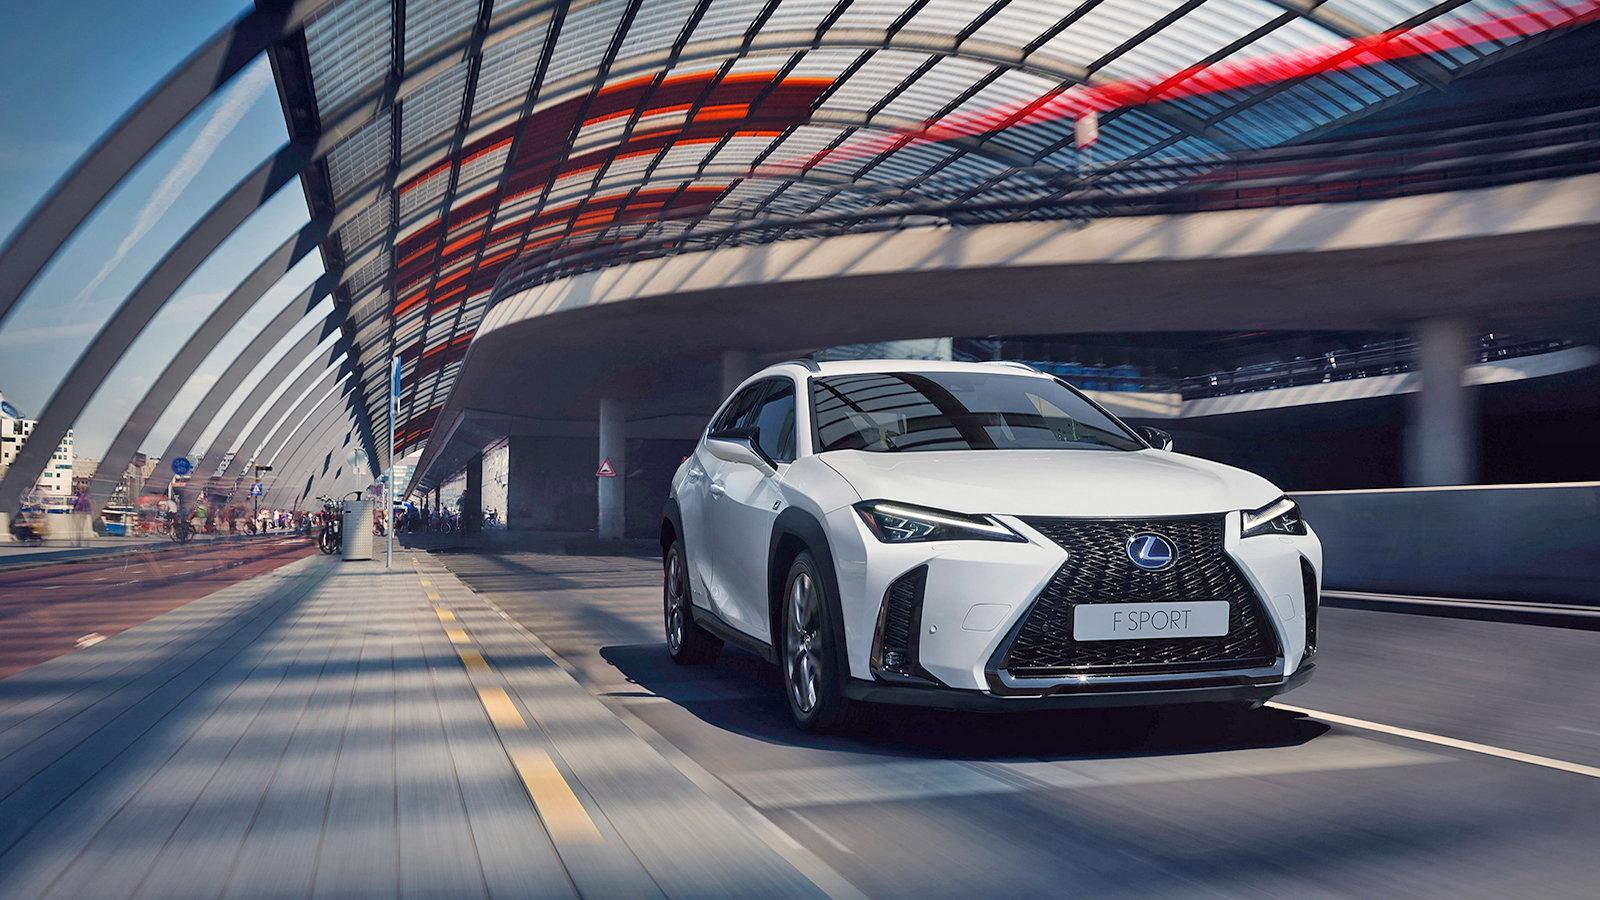 Types Of Lexus >> Types Of Lexus Auto Car Reviews 2019 2020